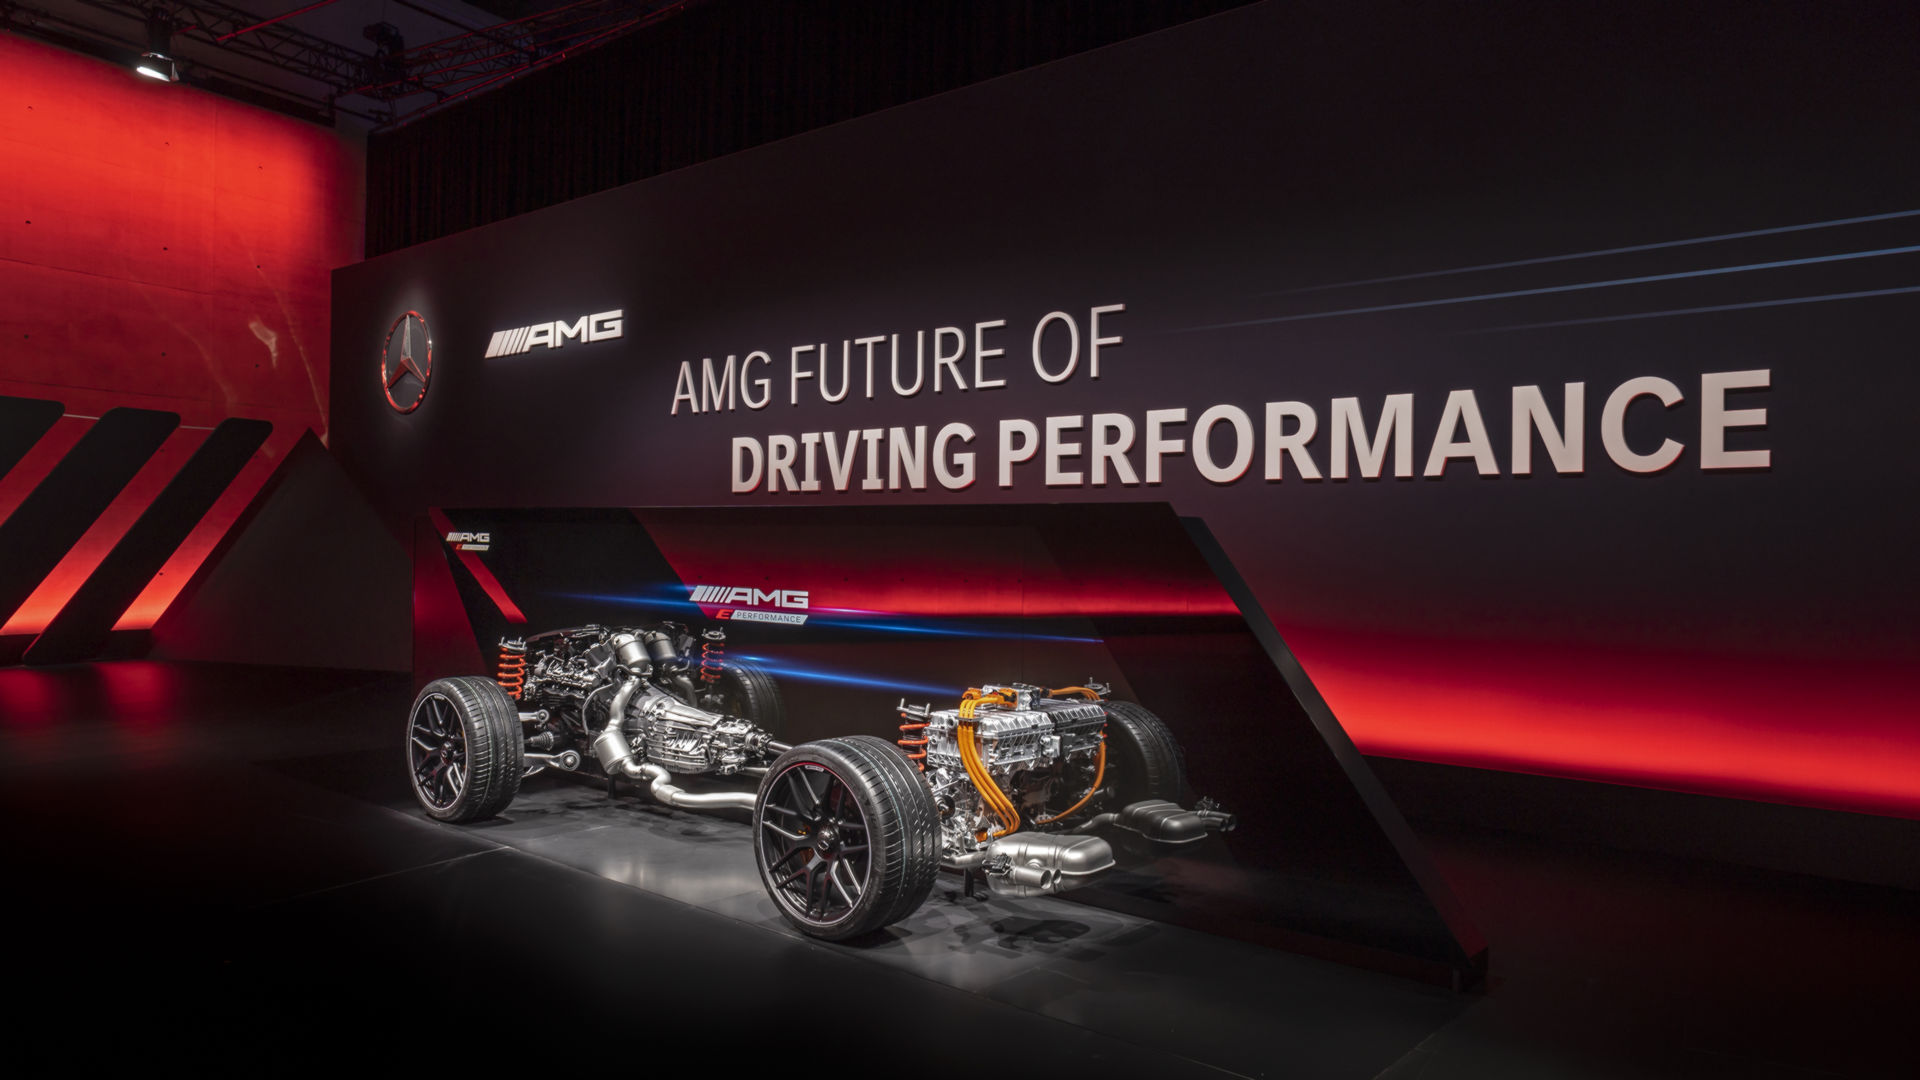 Mercedes-AMG-Ev-hybrid-12